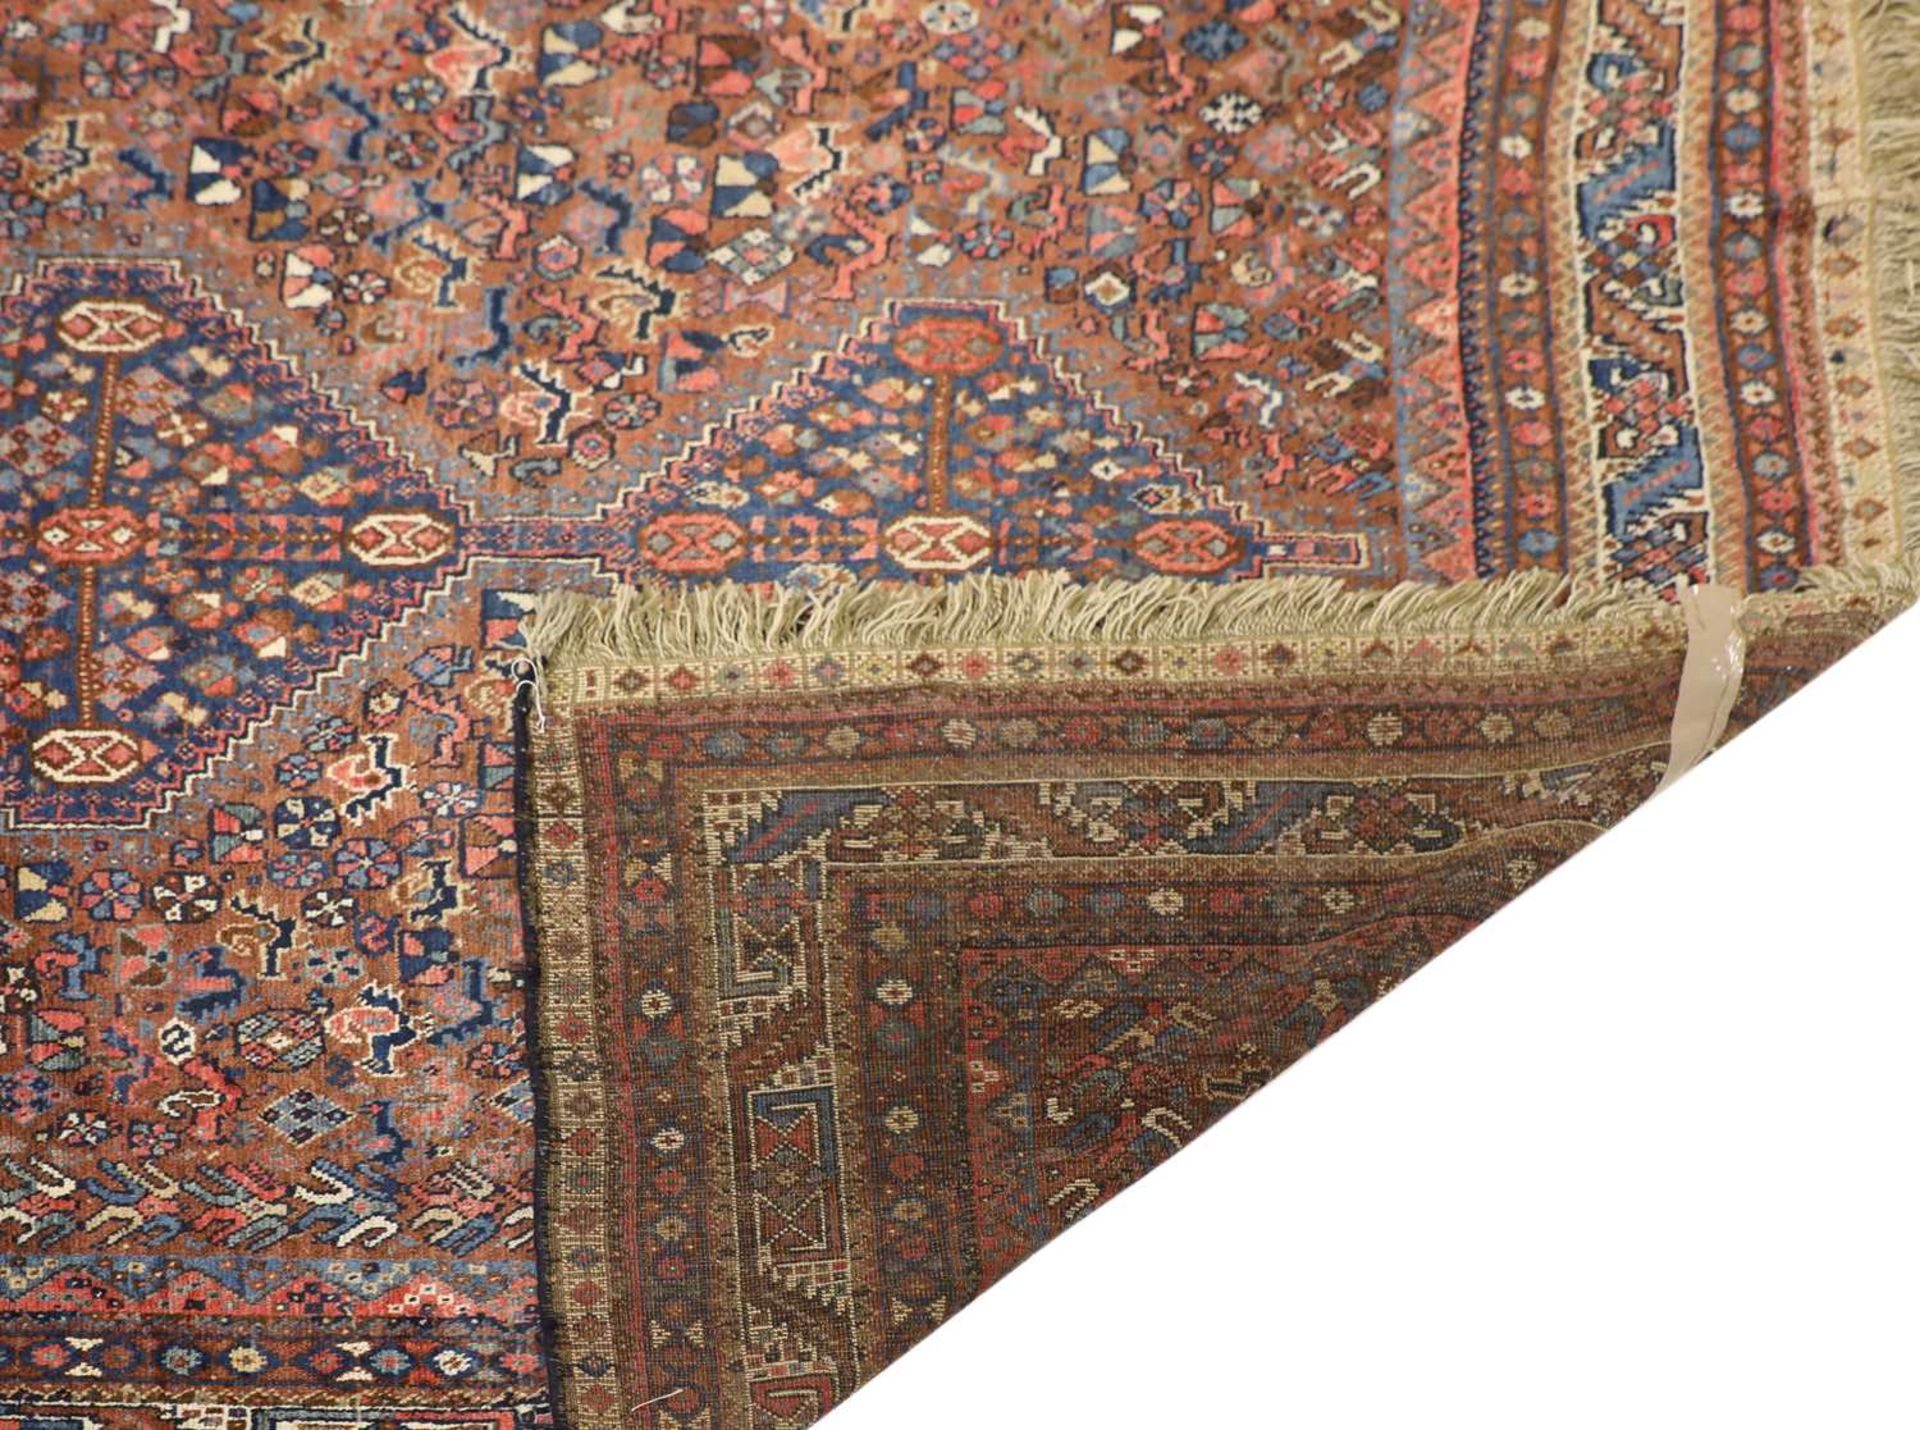 A South West Persian Khamseh carpet, - Image 2 of 17